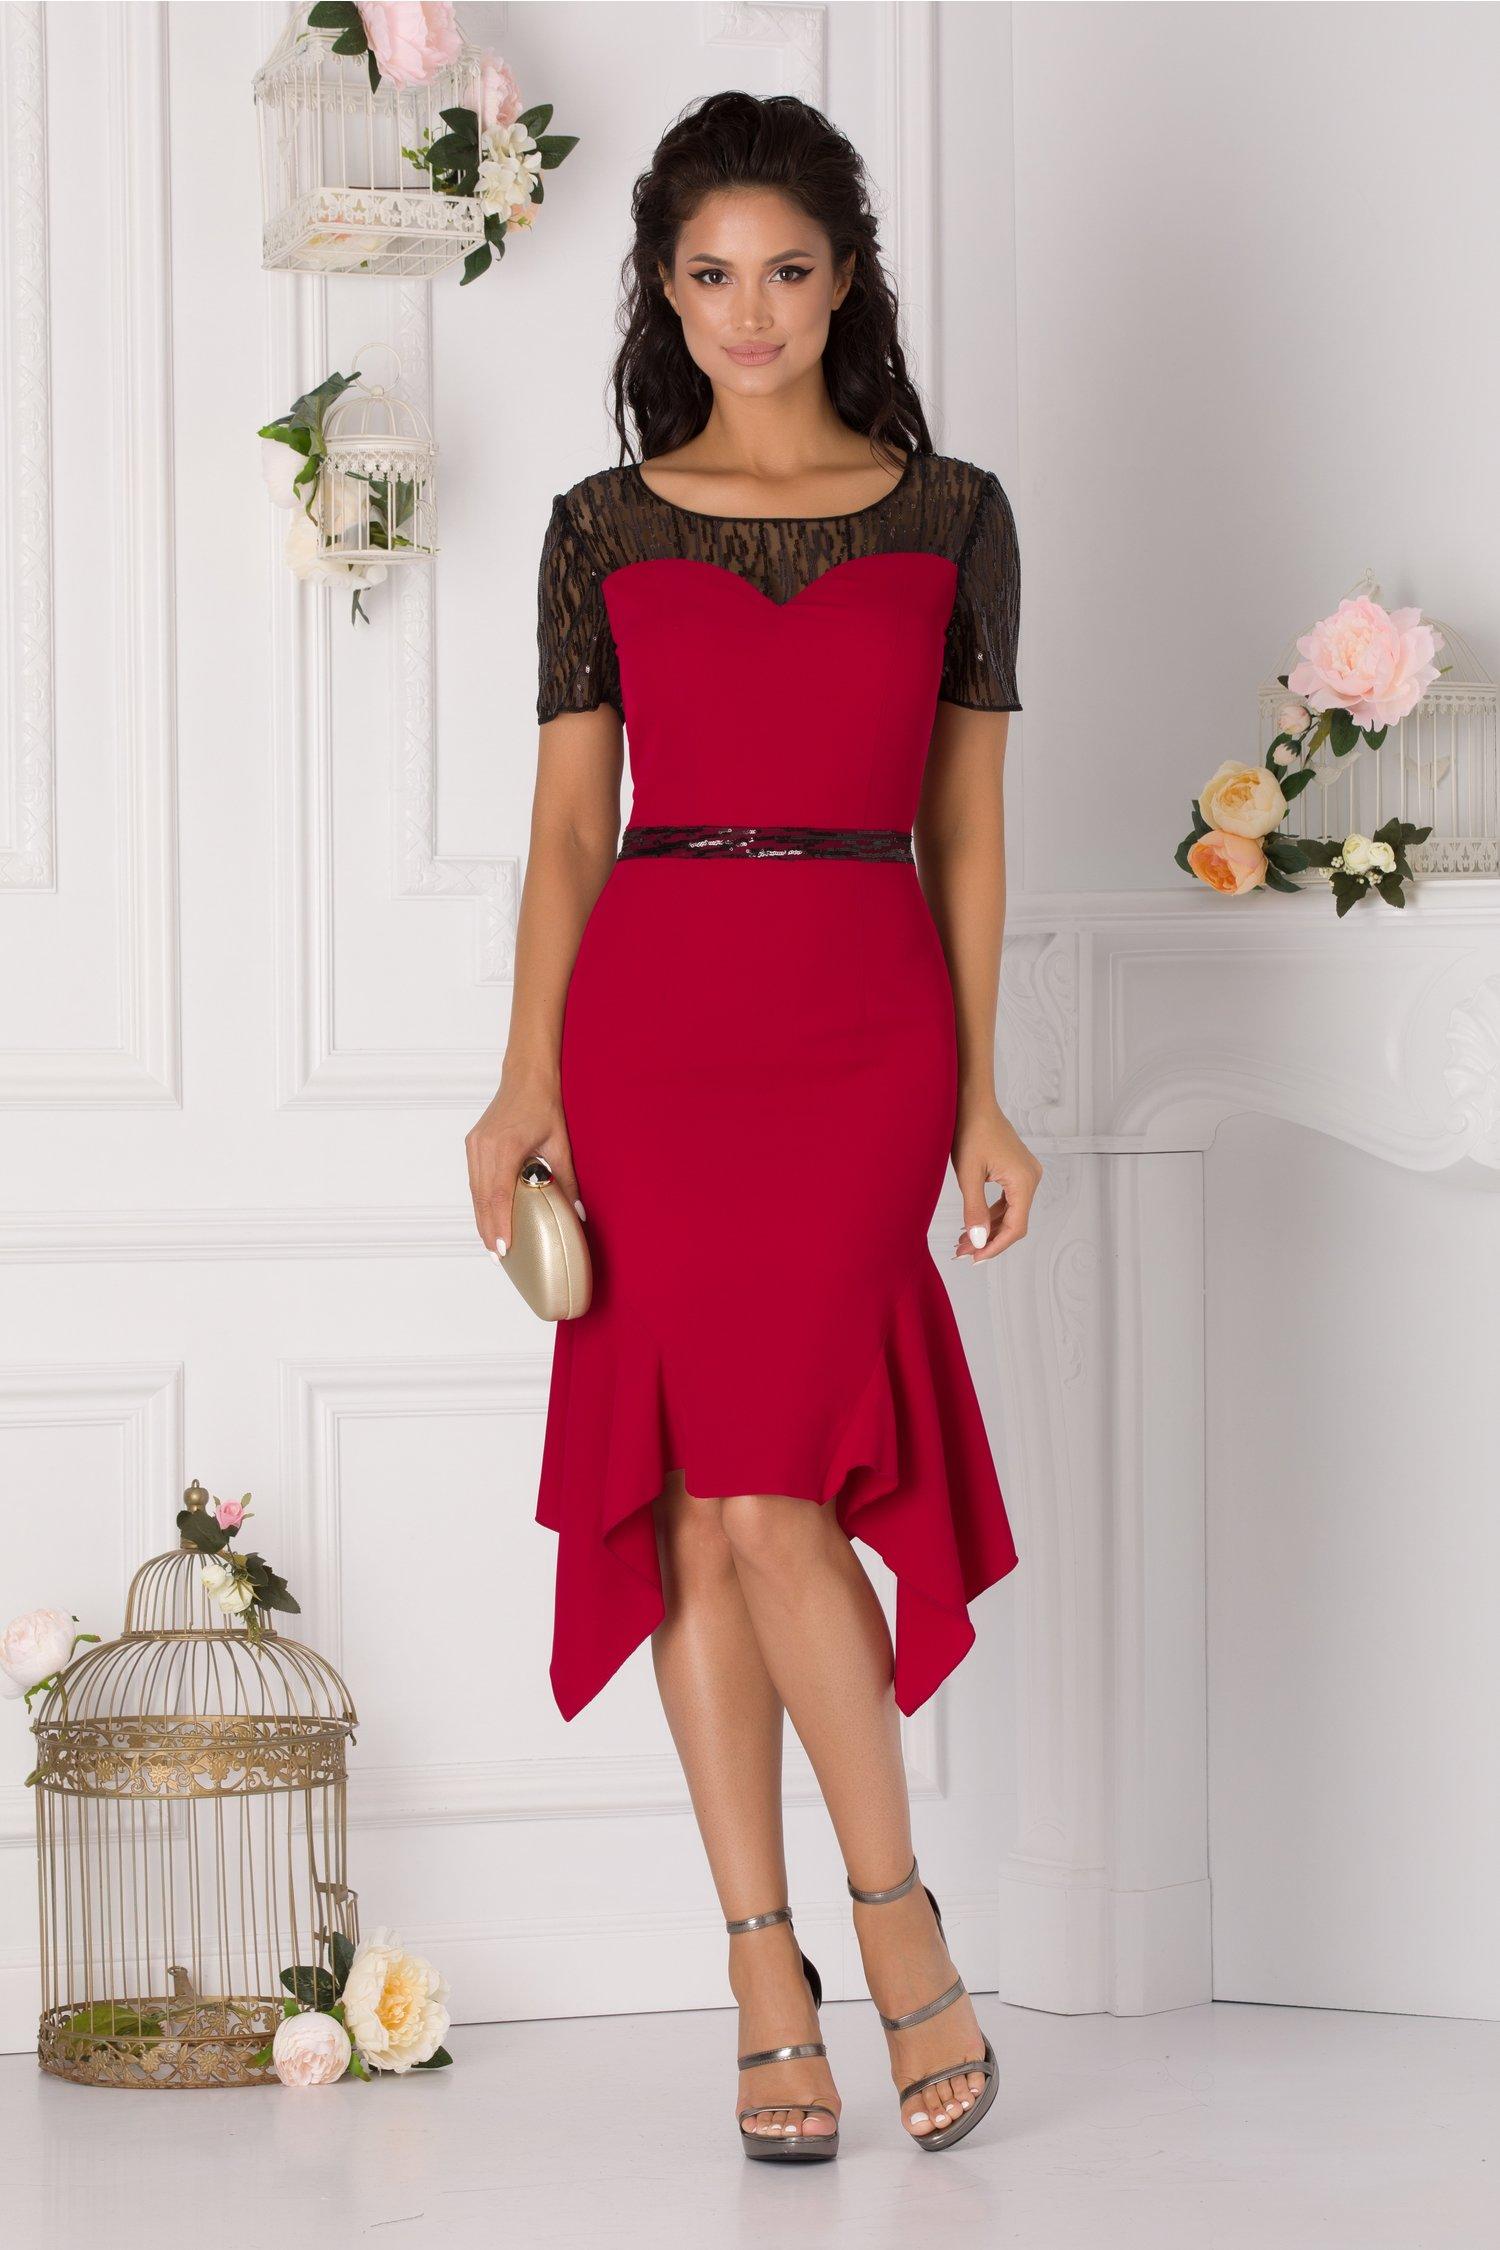 rochie violeta bordo cu paiete si croi asimetric 327569 4